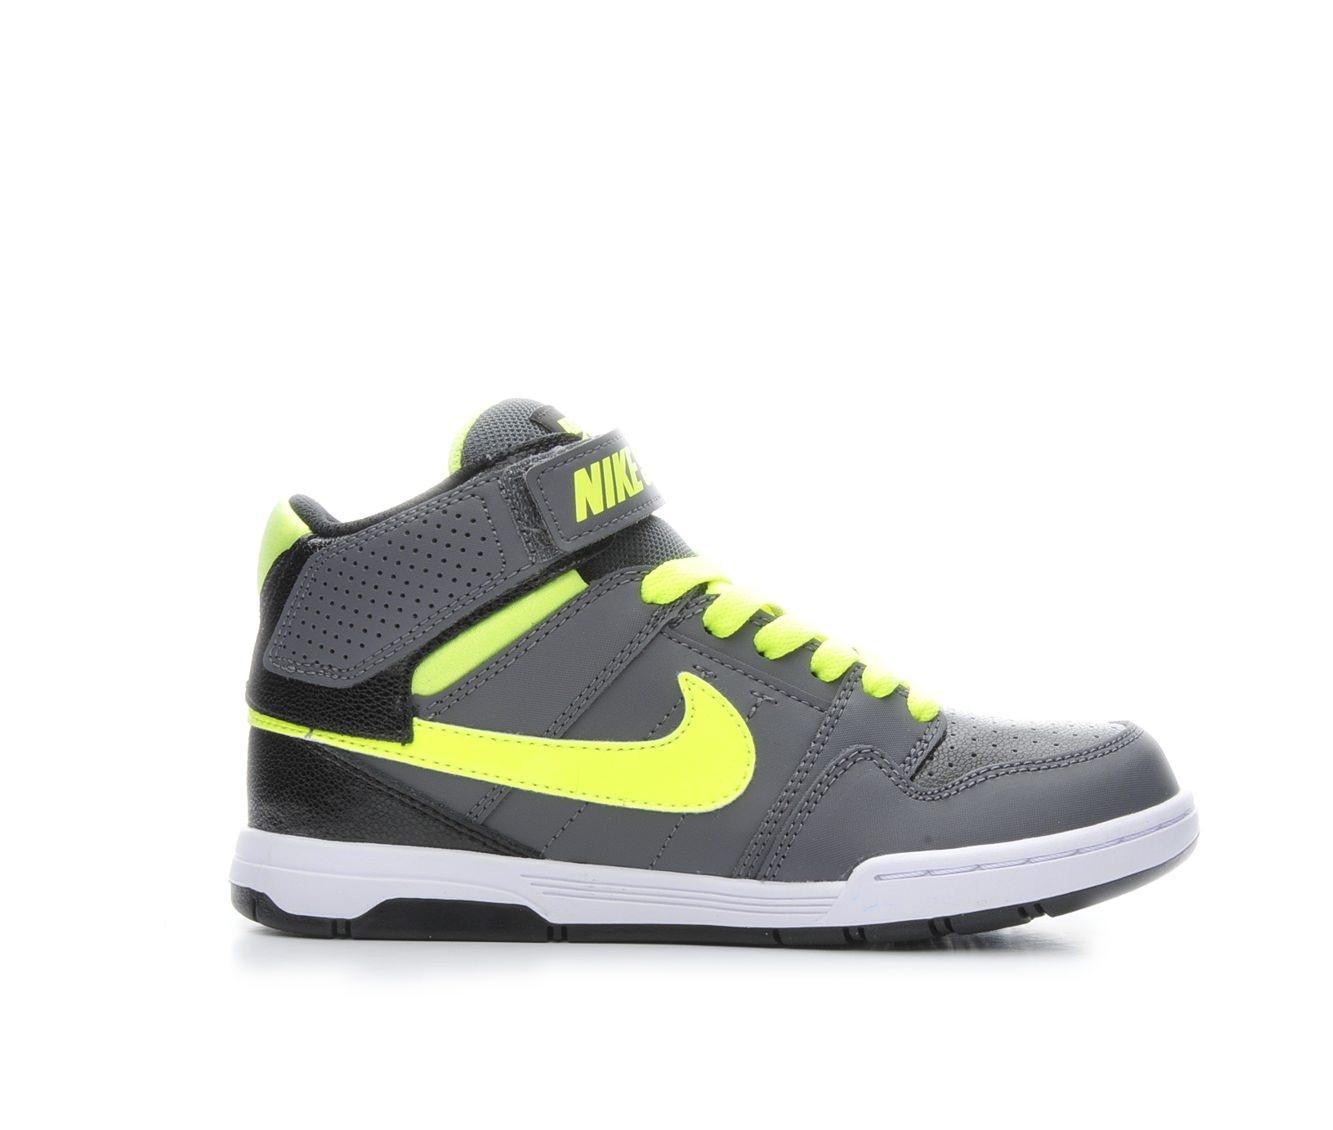 Boys' Nike Mogan Mid 2 Jr Skate Shoes (Grey)